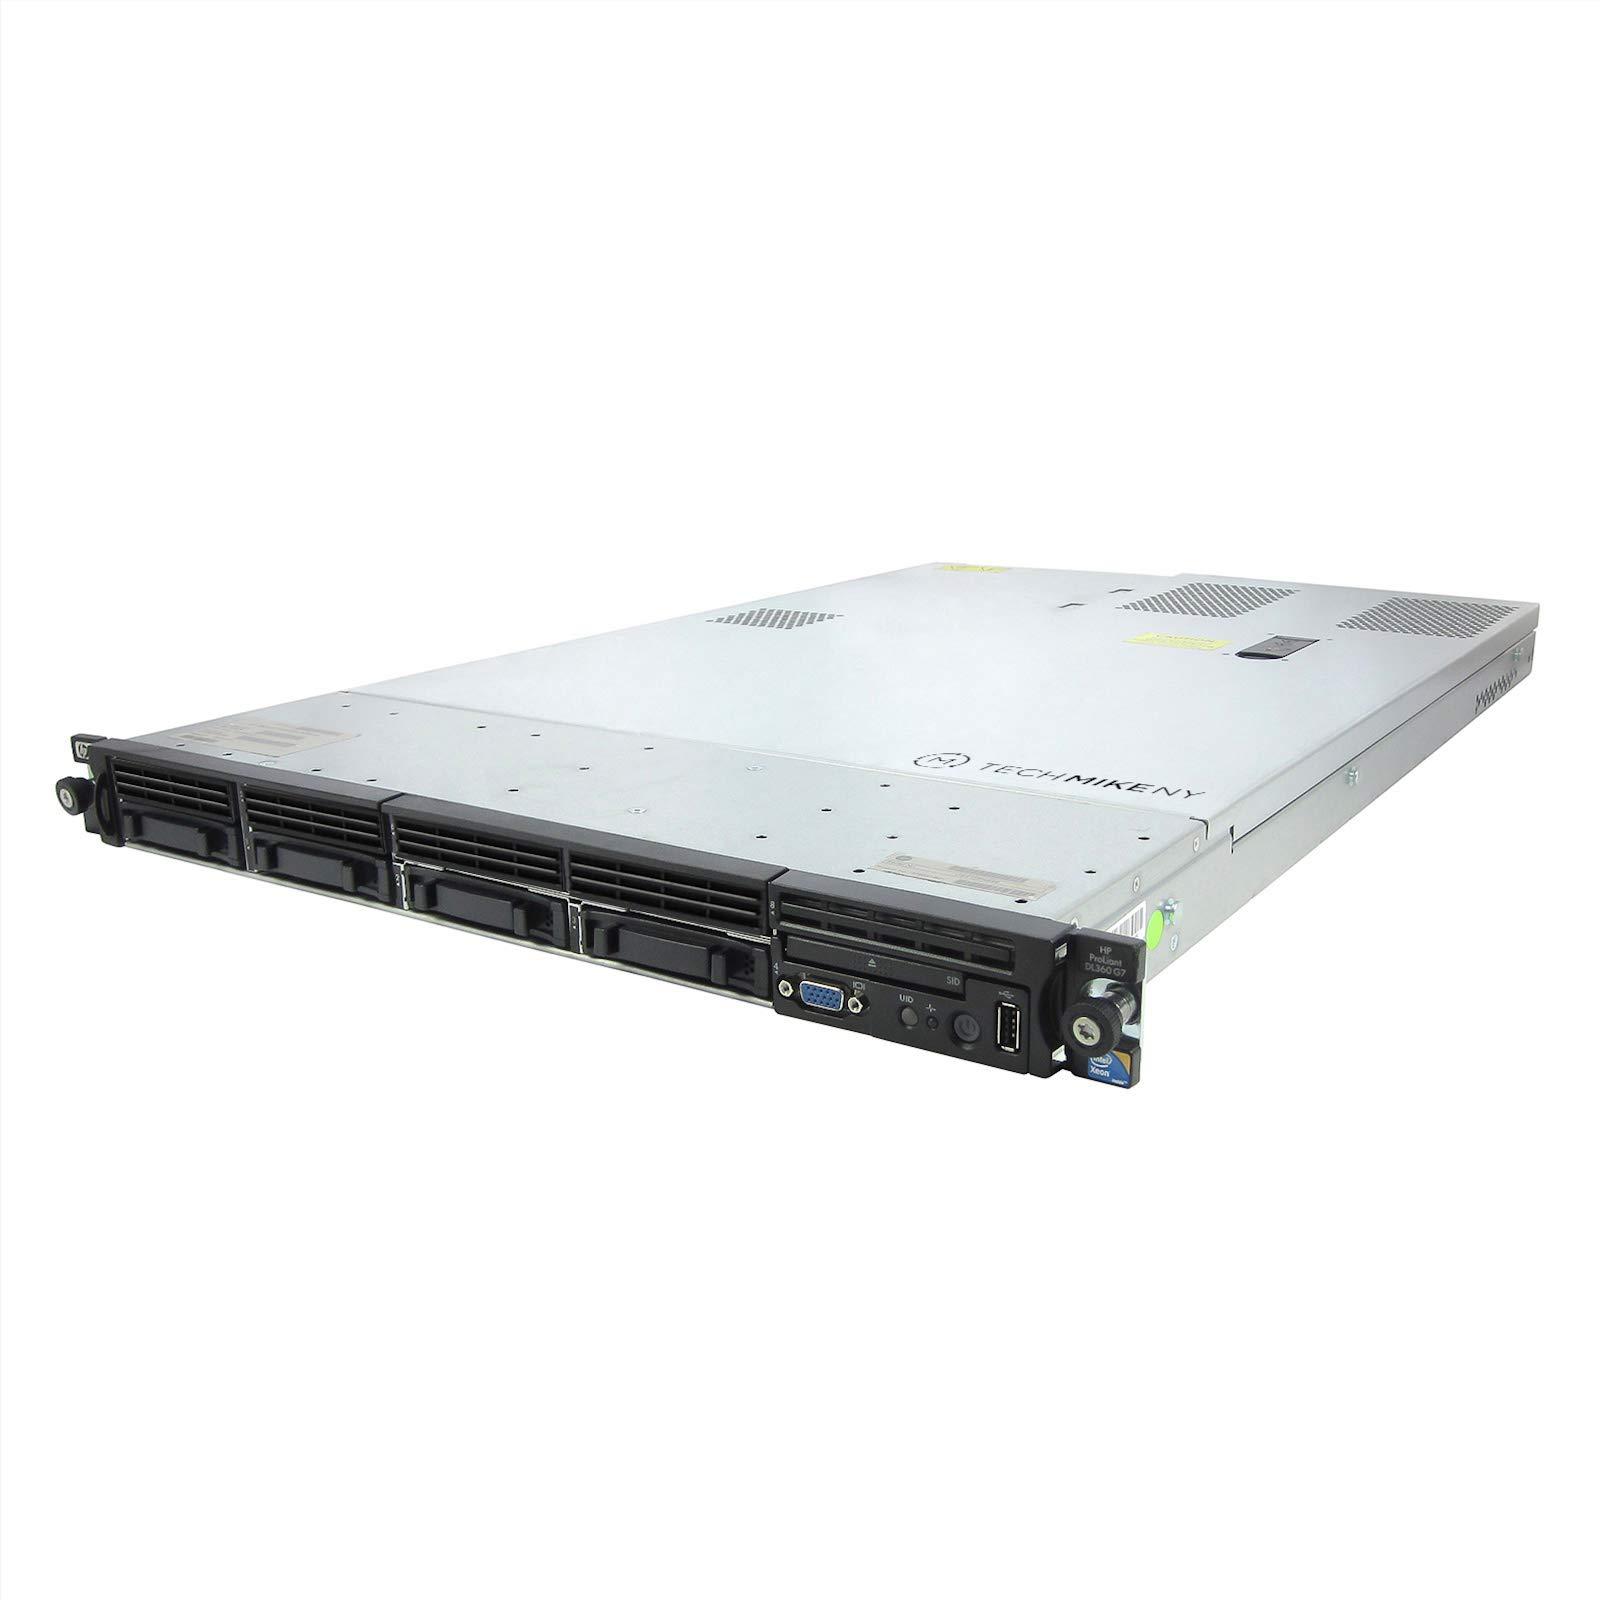 HP ProLiant DL360 G7 Server 2X 3.06Ghz X5675 6C 144GB 2X 146GB 15K SAS High-End (Renewed)